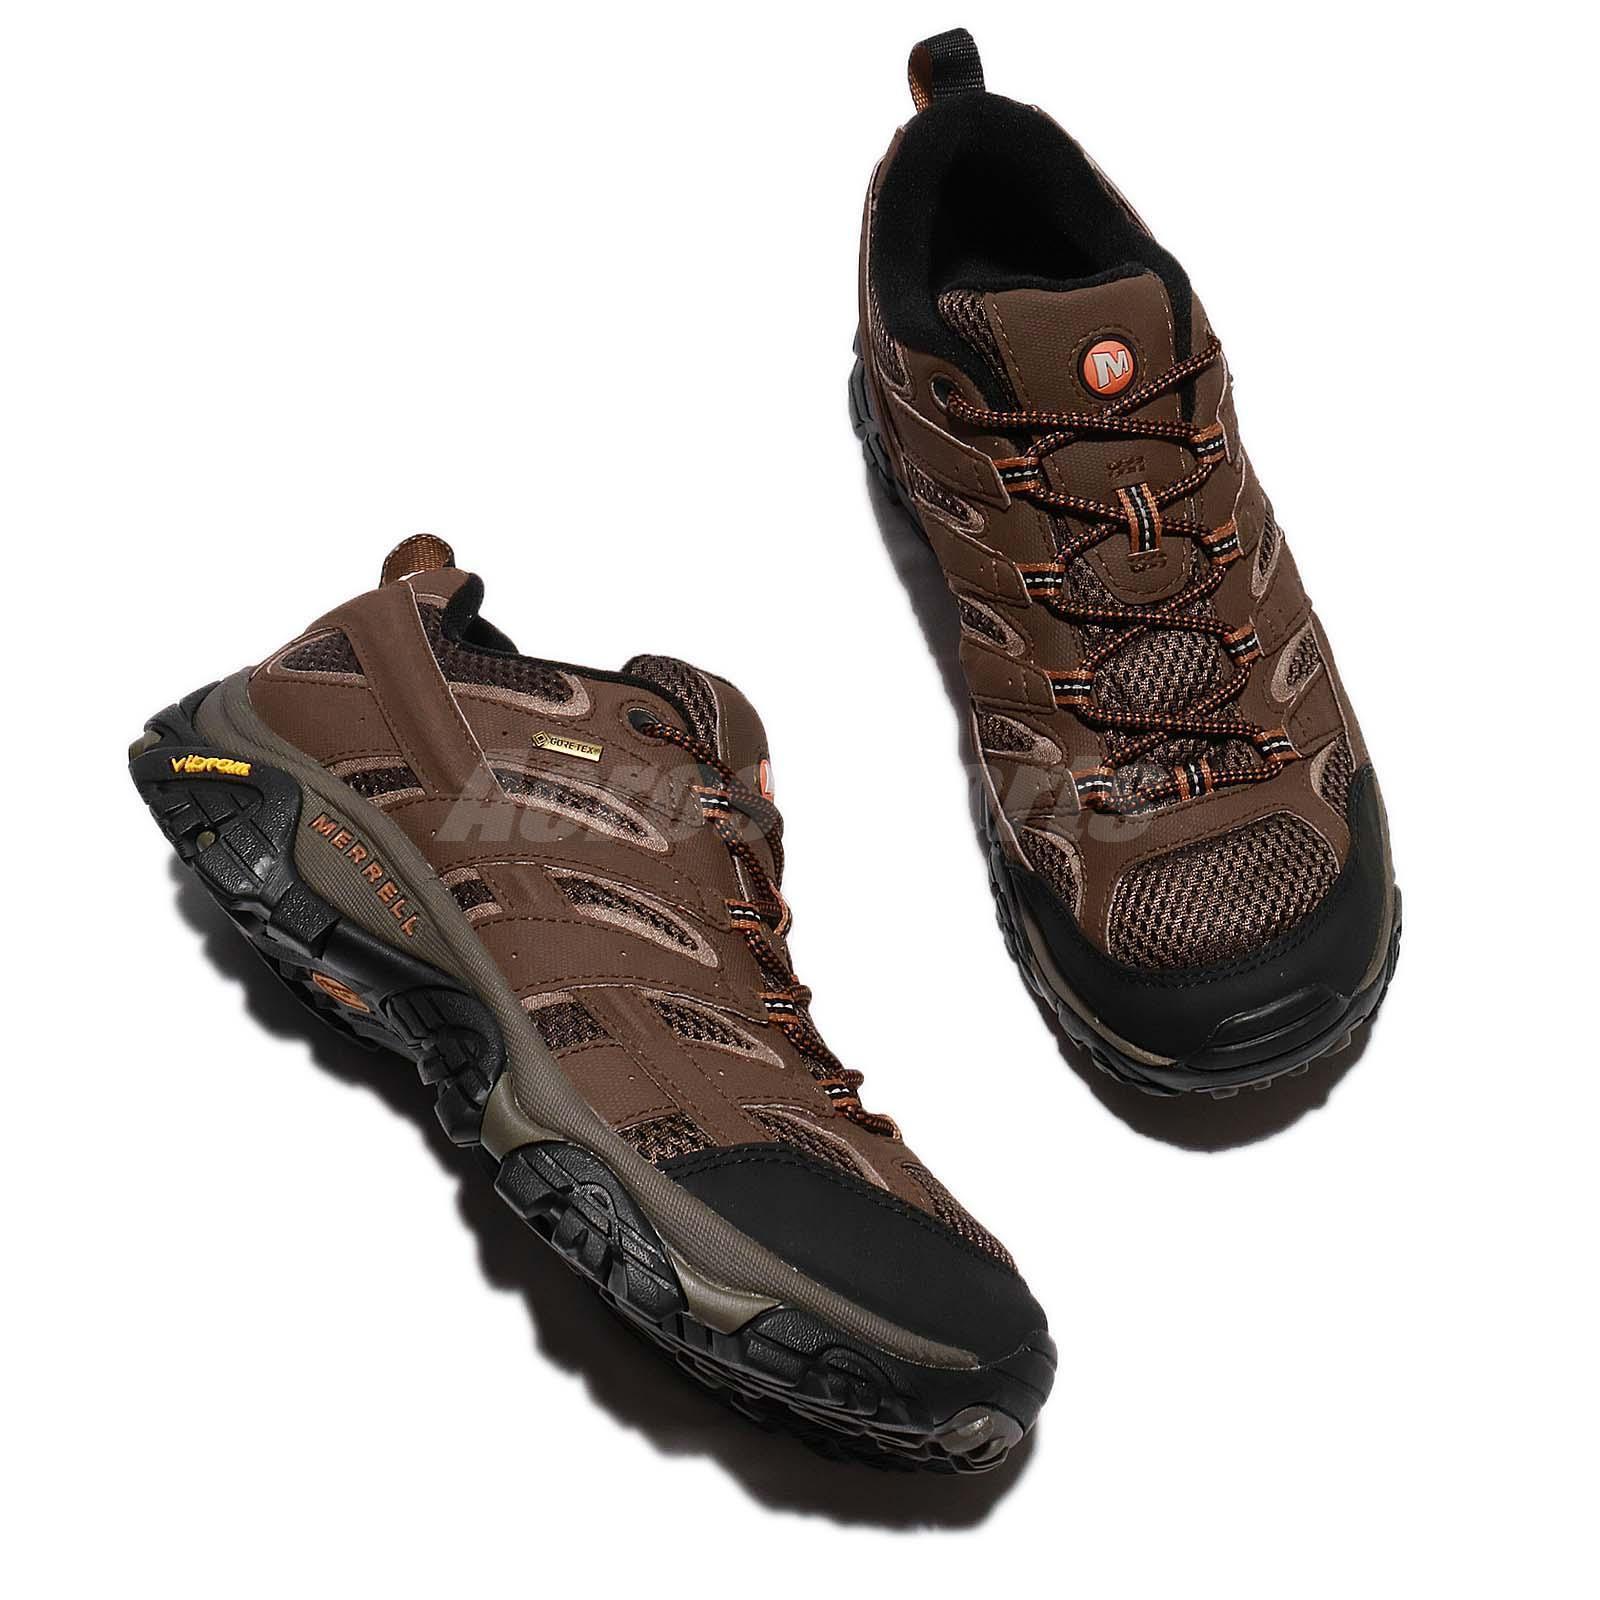 Merrell Moab 2 GTX Gore-Tex Earth Earth Earth Brown Black   Outdoors Shoes Sneaker ML06041 2406fe